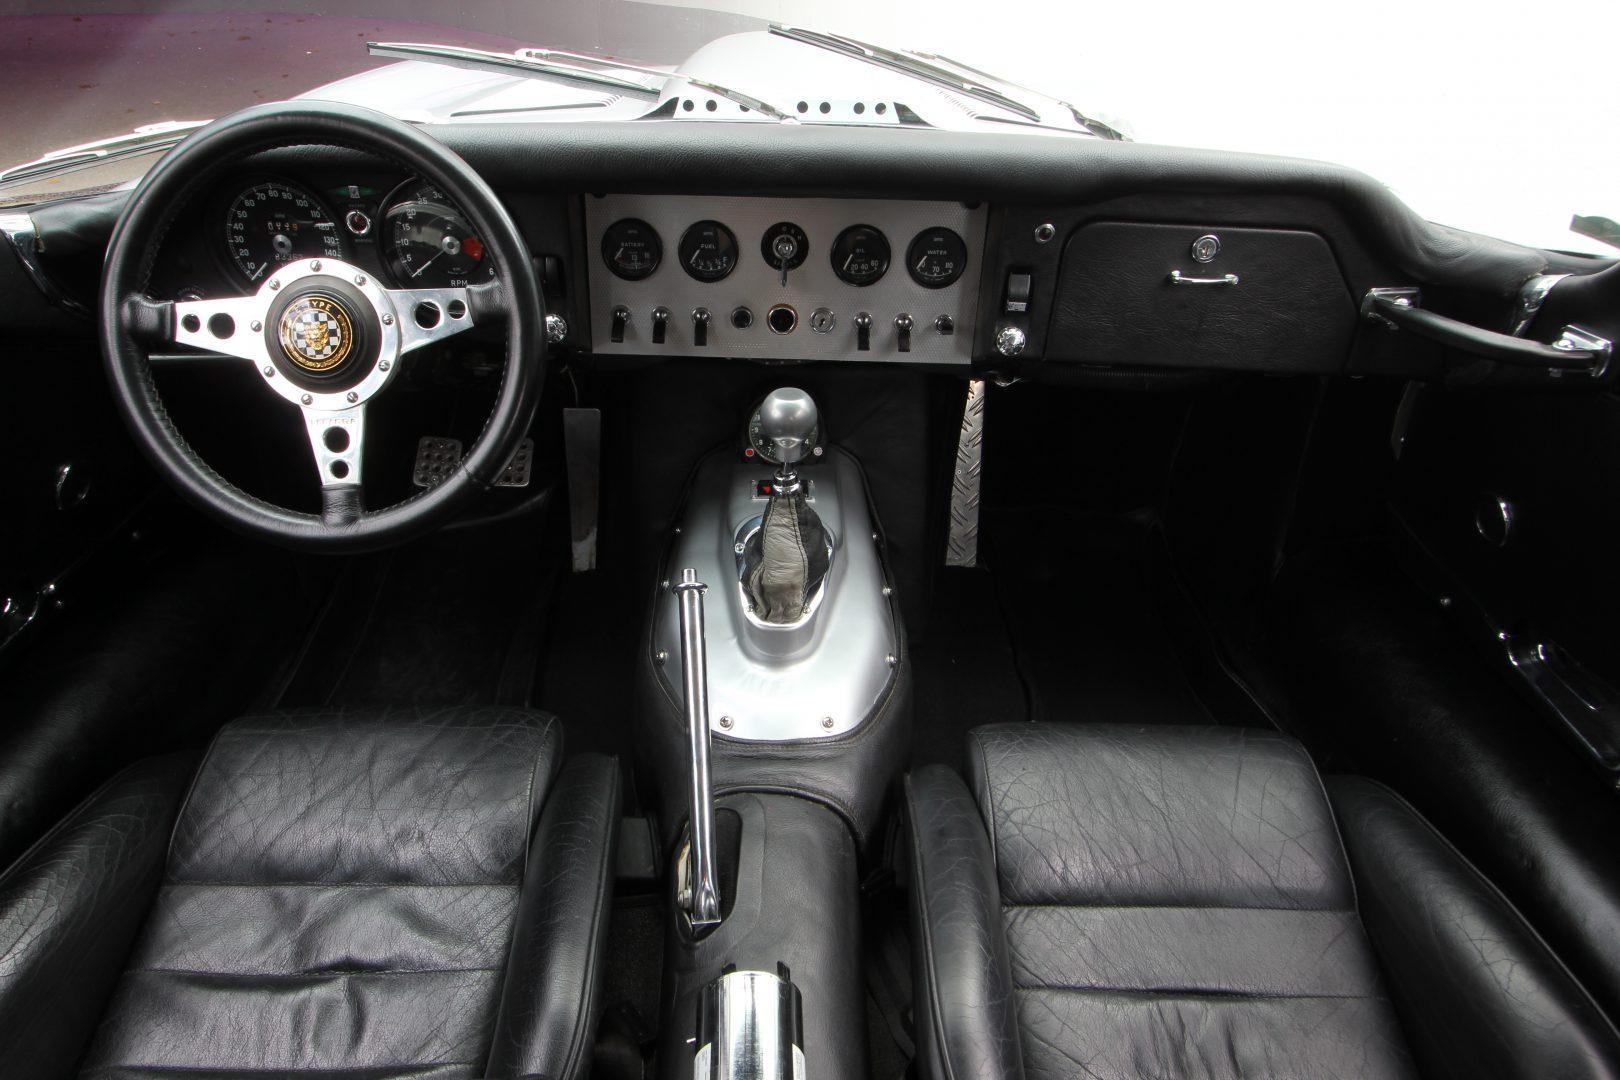 AIL Jaguar E-Type Coupé S1,5 Lightweight Recreation 1